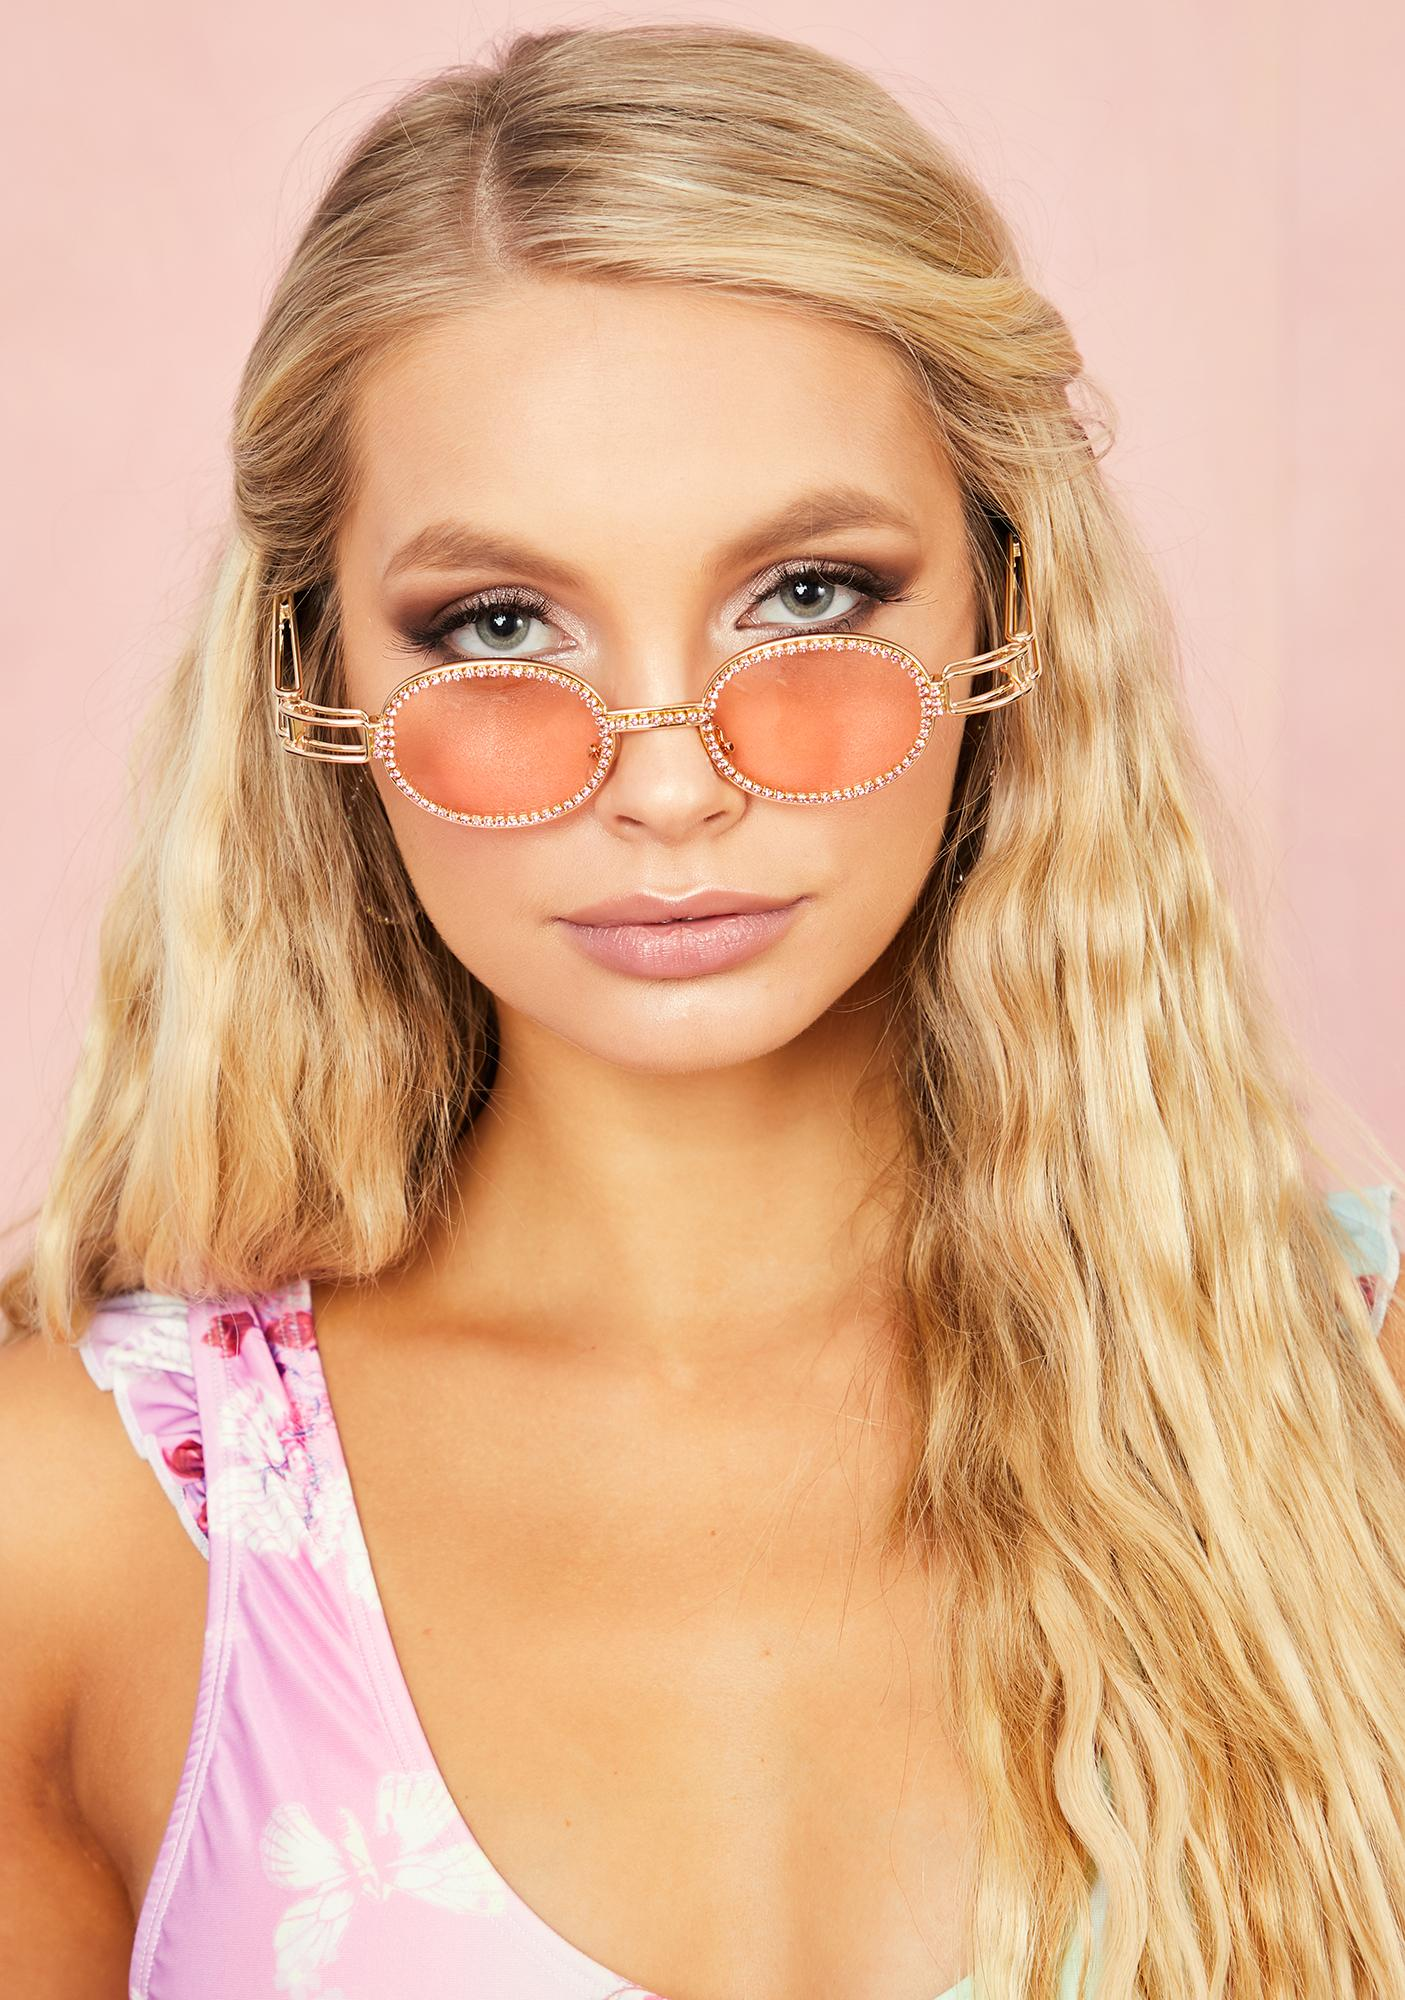 Beverly Hills Rhapsody Oval Sunglasses